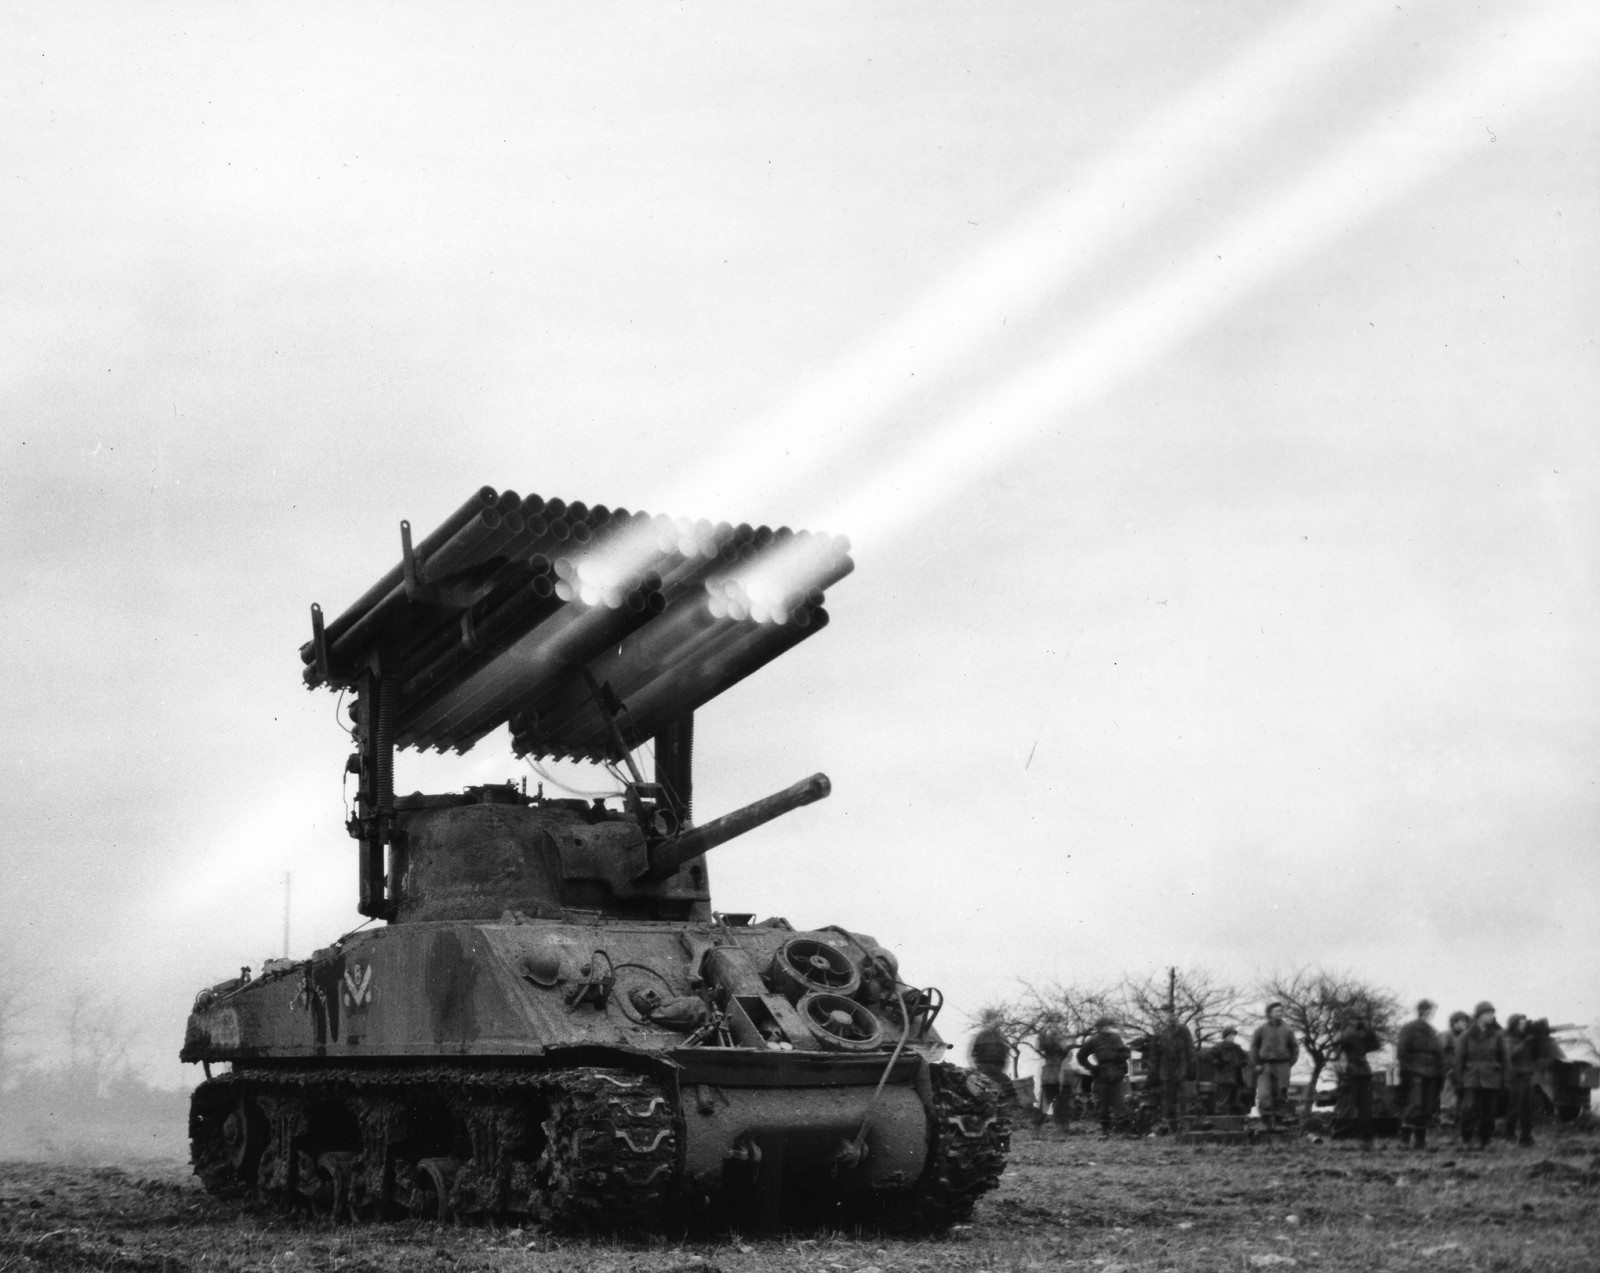 M4_Sherman_T34_Calliope